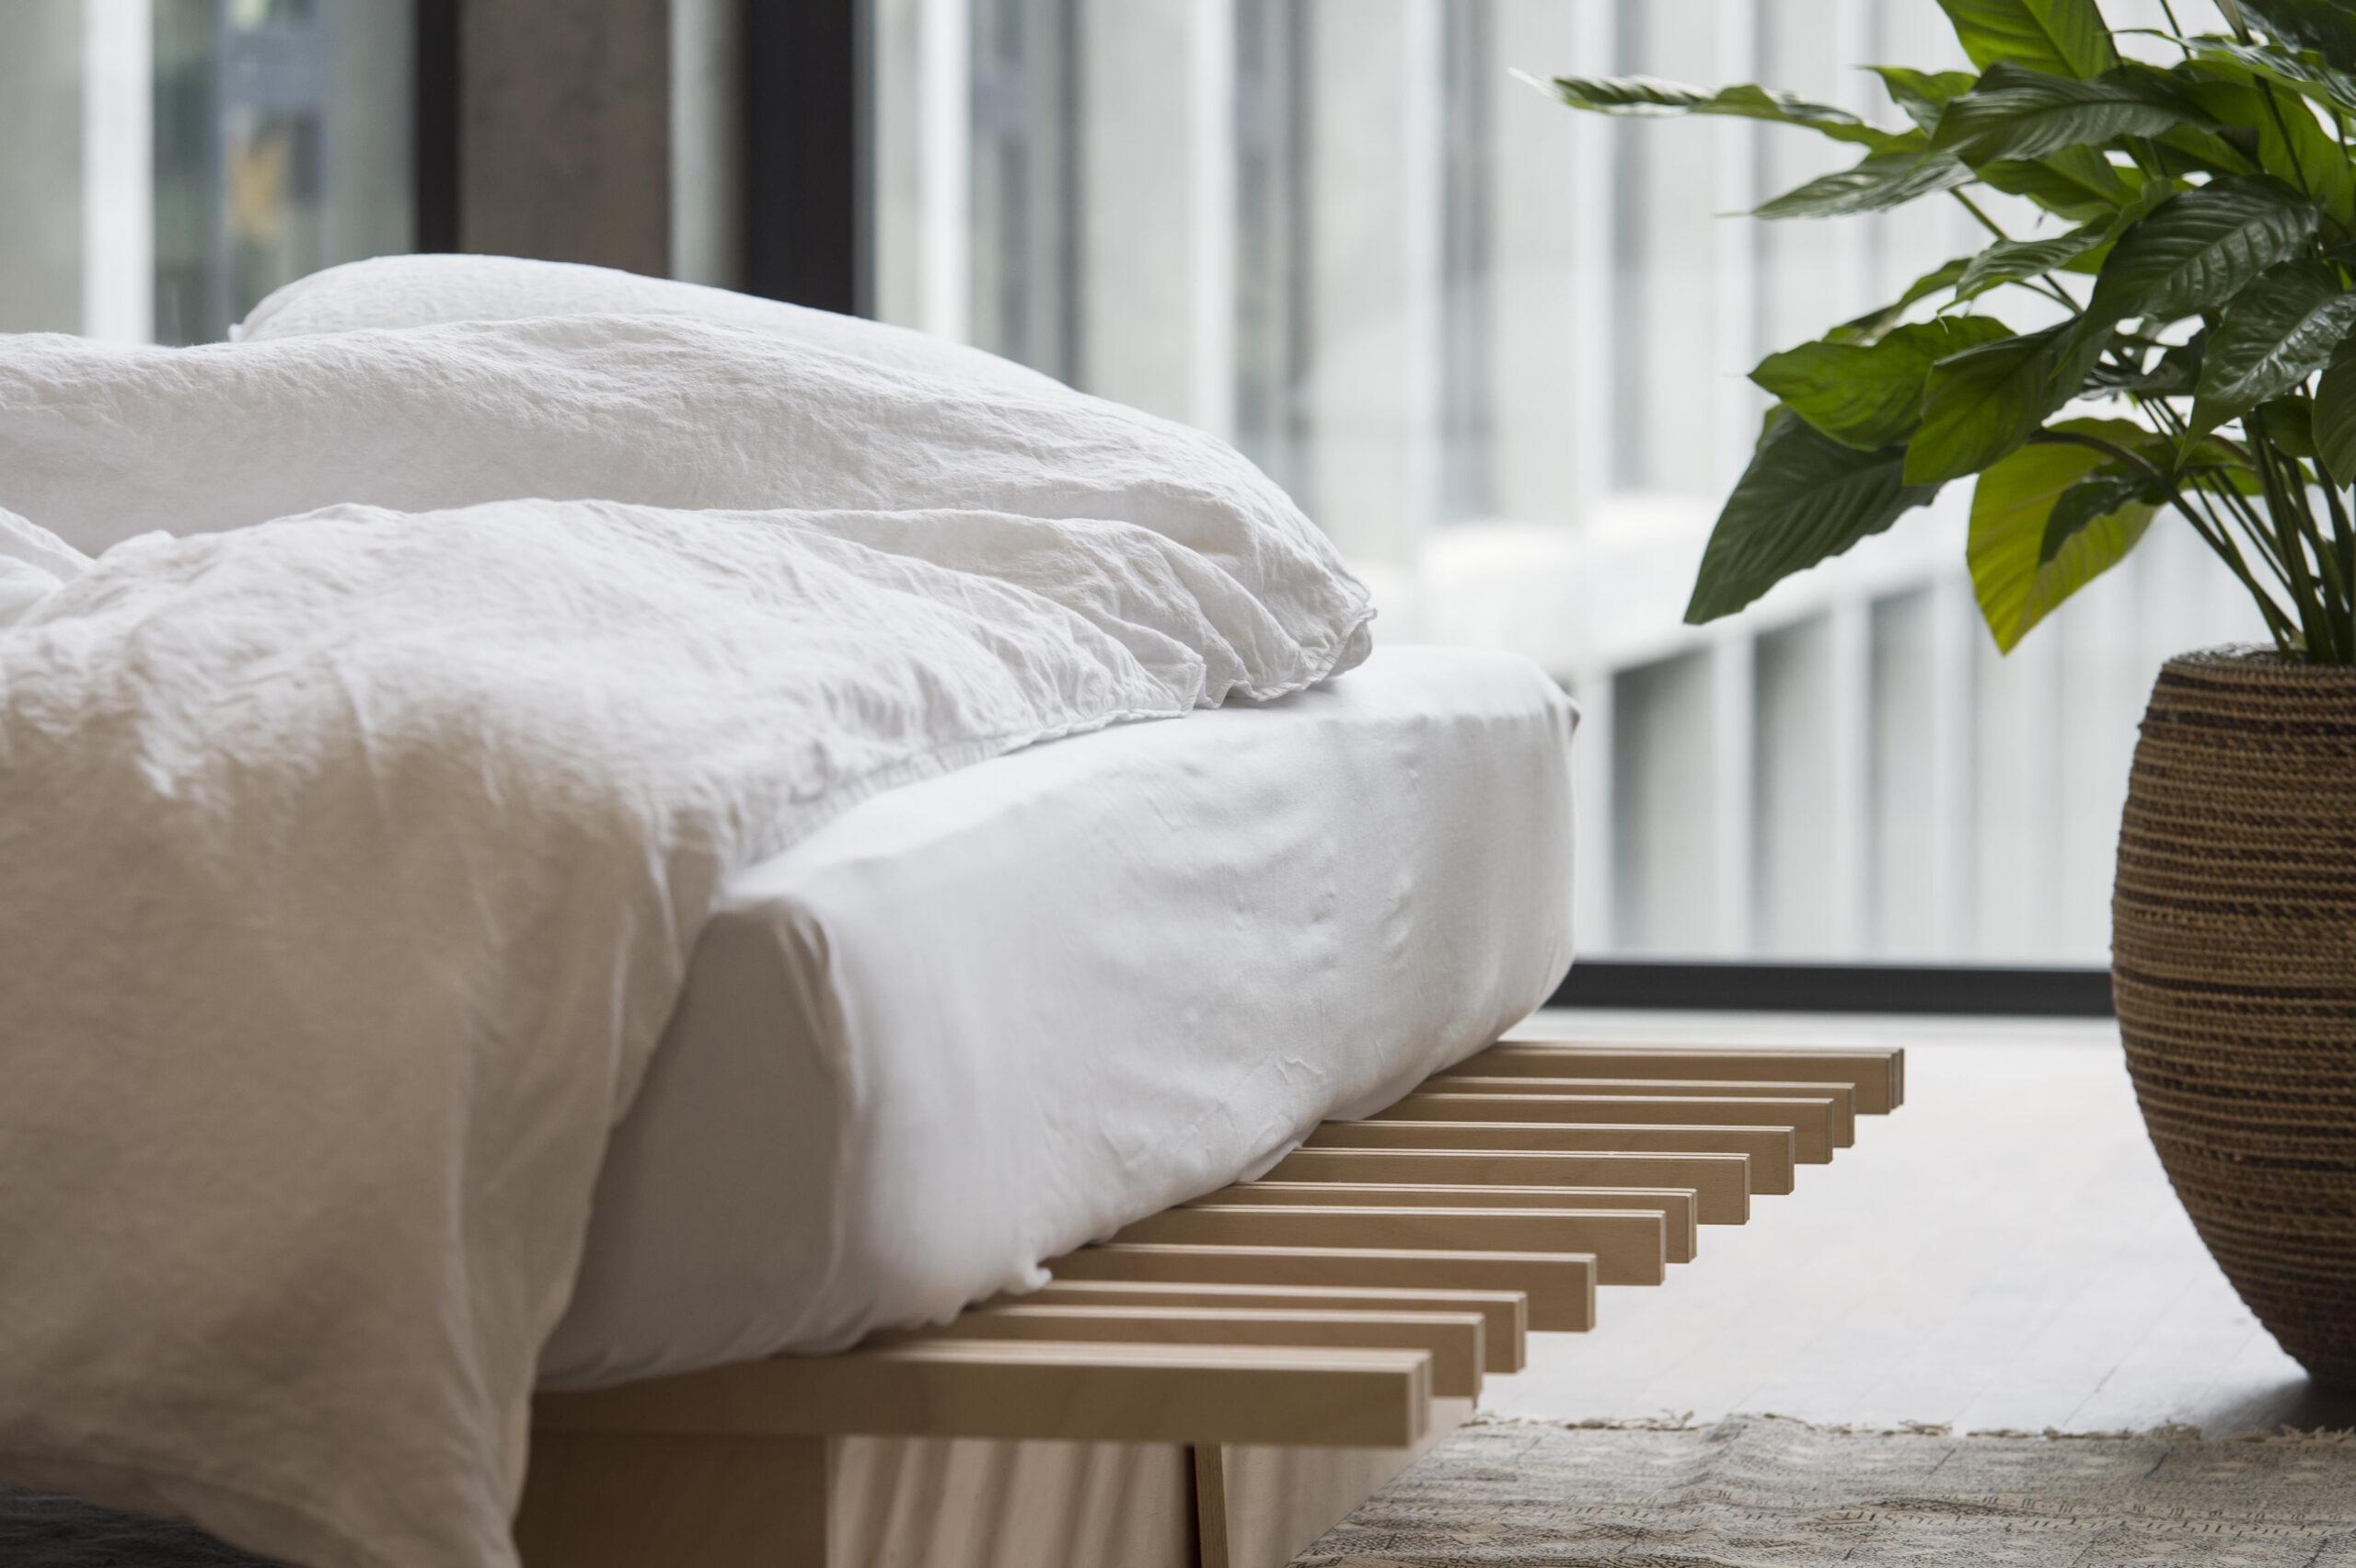 Full Size of Tojo V Bett Sushi Vancouver Bc Bed Preisvergleich Restaurant Review Yamamoto Video Erfahrung Bett  Matratzen Test Microspot Idealo 36 E0 Fhrung Velux Fenster Wohnzimmer Tojo V